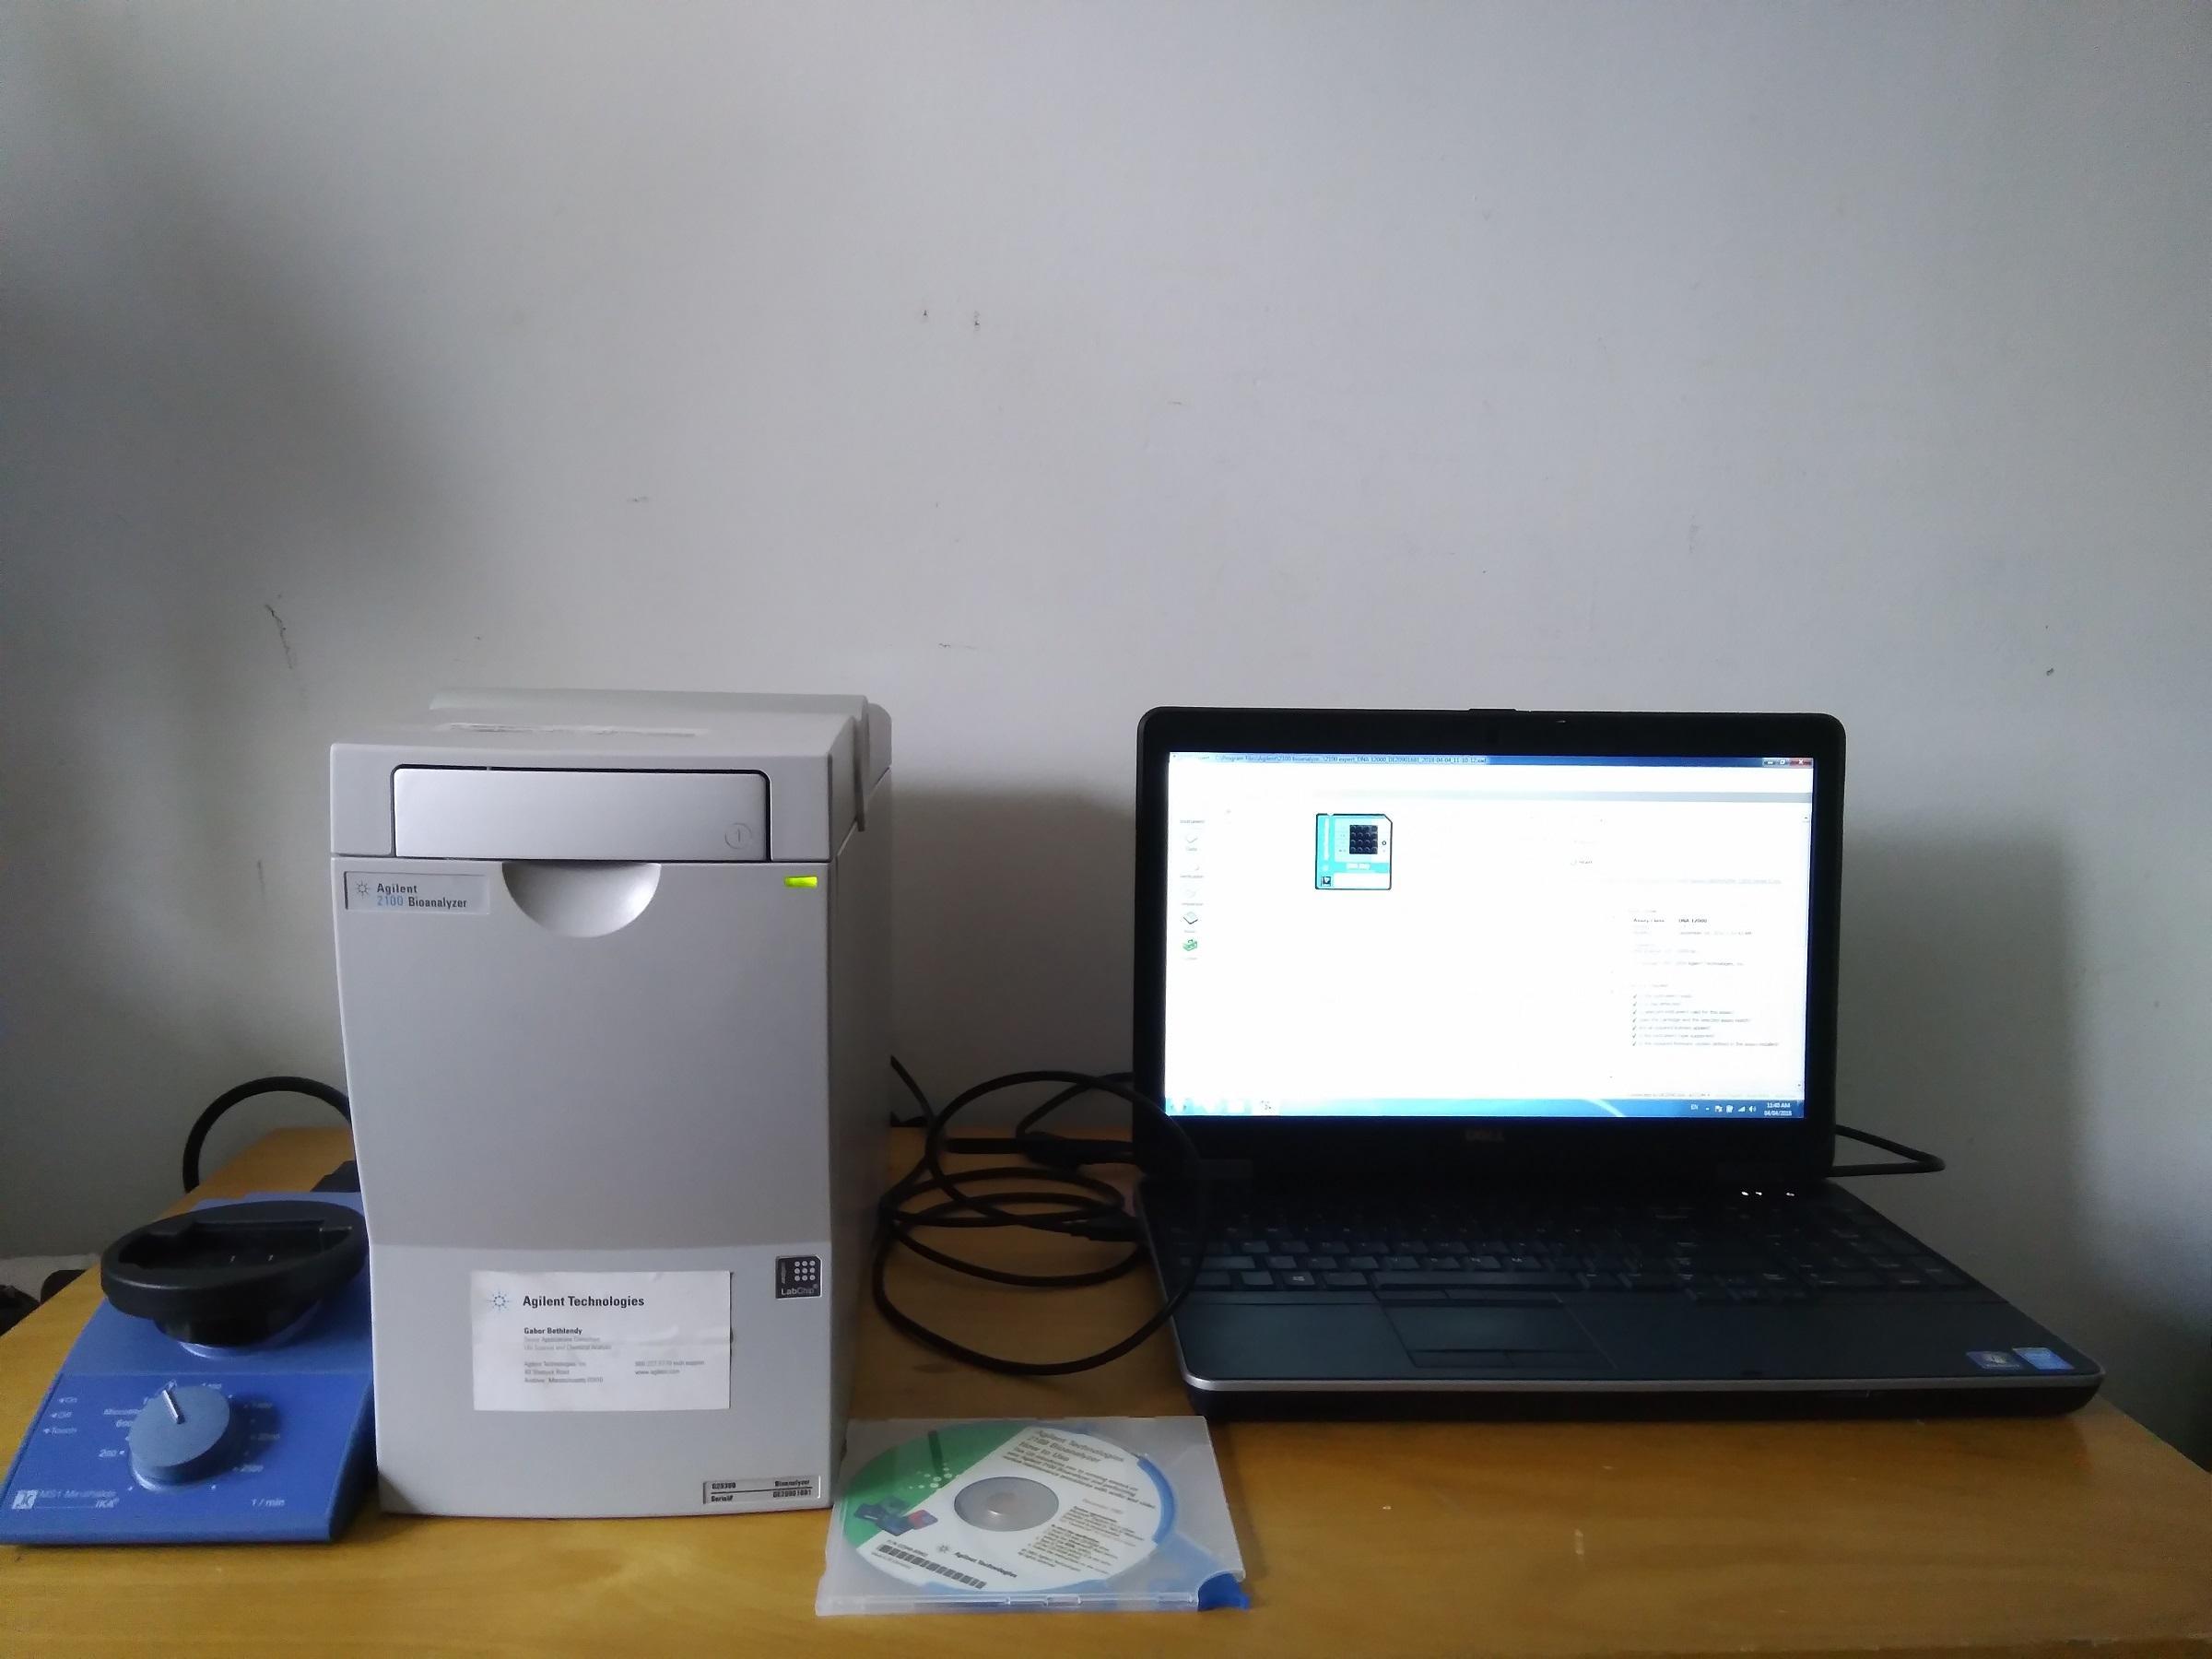 Agilent 2100 Bioanalyzer G2938B + Softwares + Chip Vortexer + NEW Electrode Cartridge